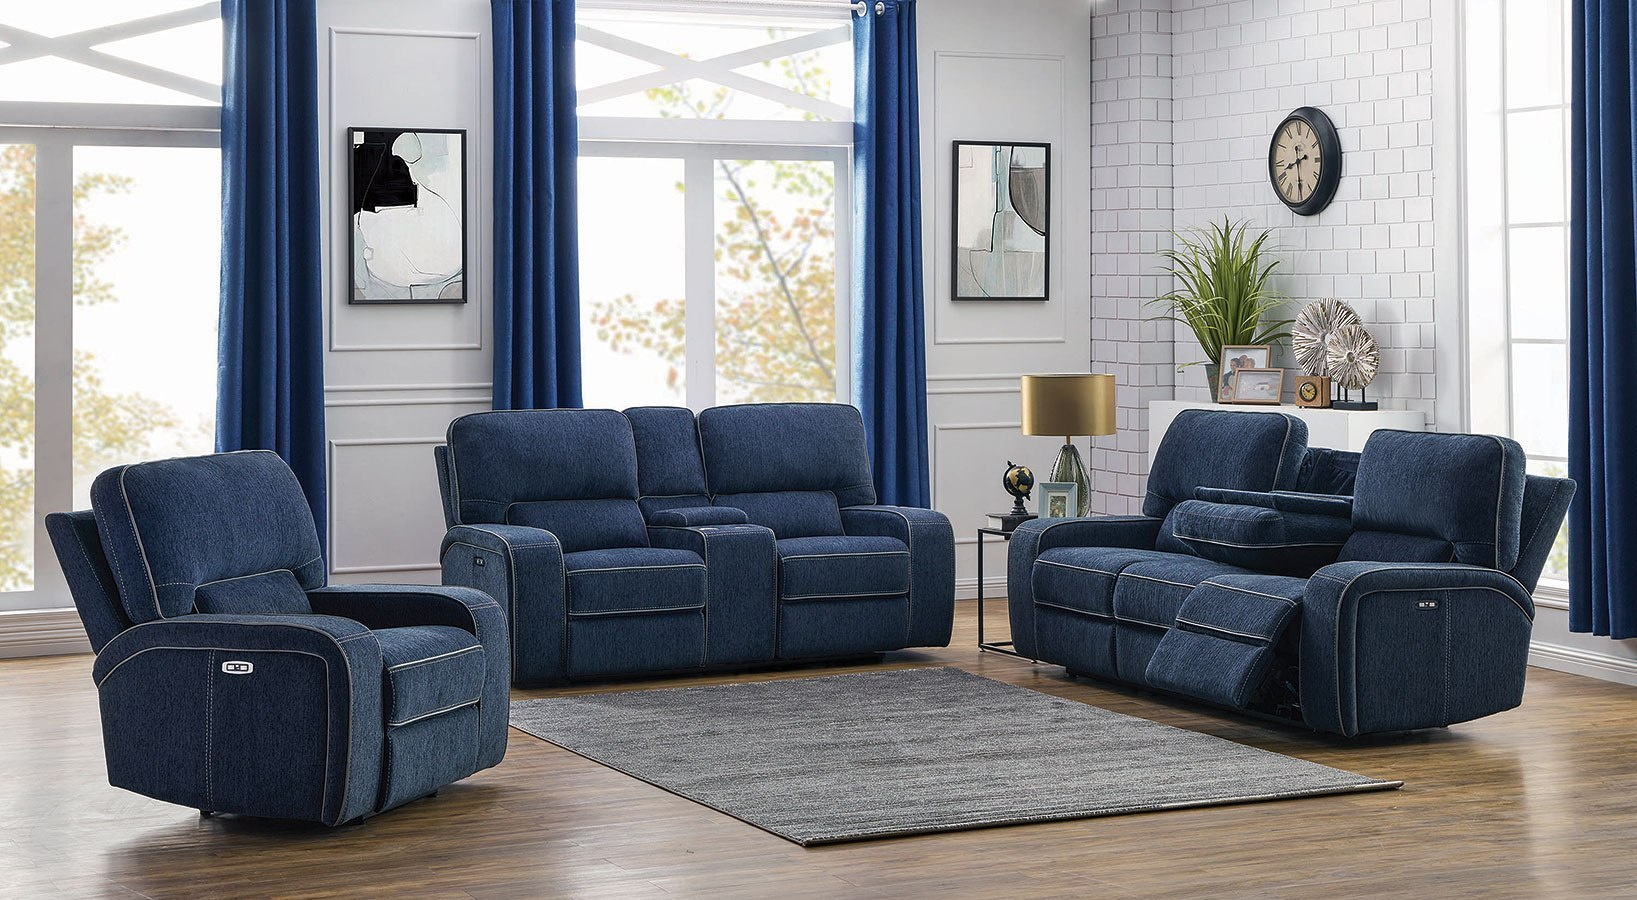 Image of: Groveland Power Reclining Living Room Set W Power Headrests Navy Blue By Coaster Furniture Furniturepick